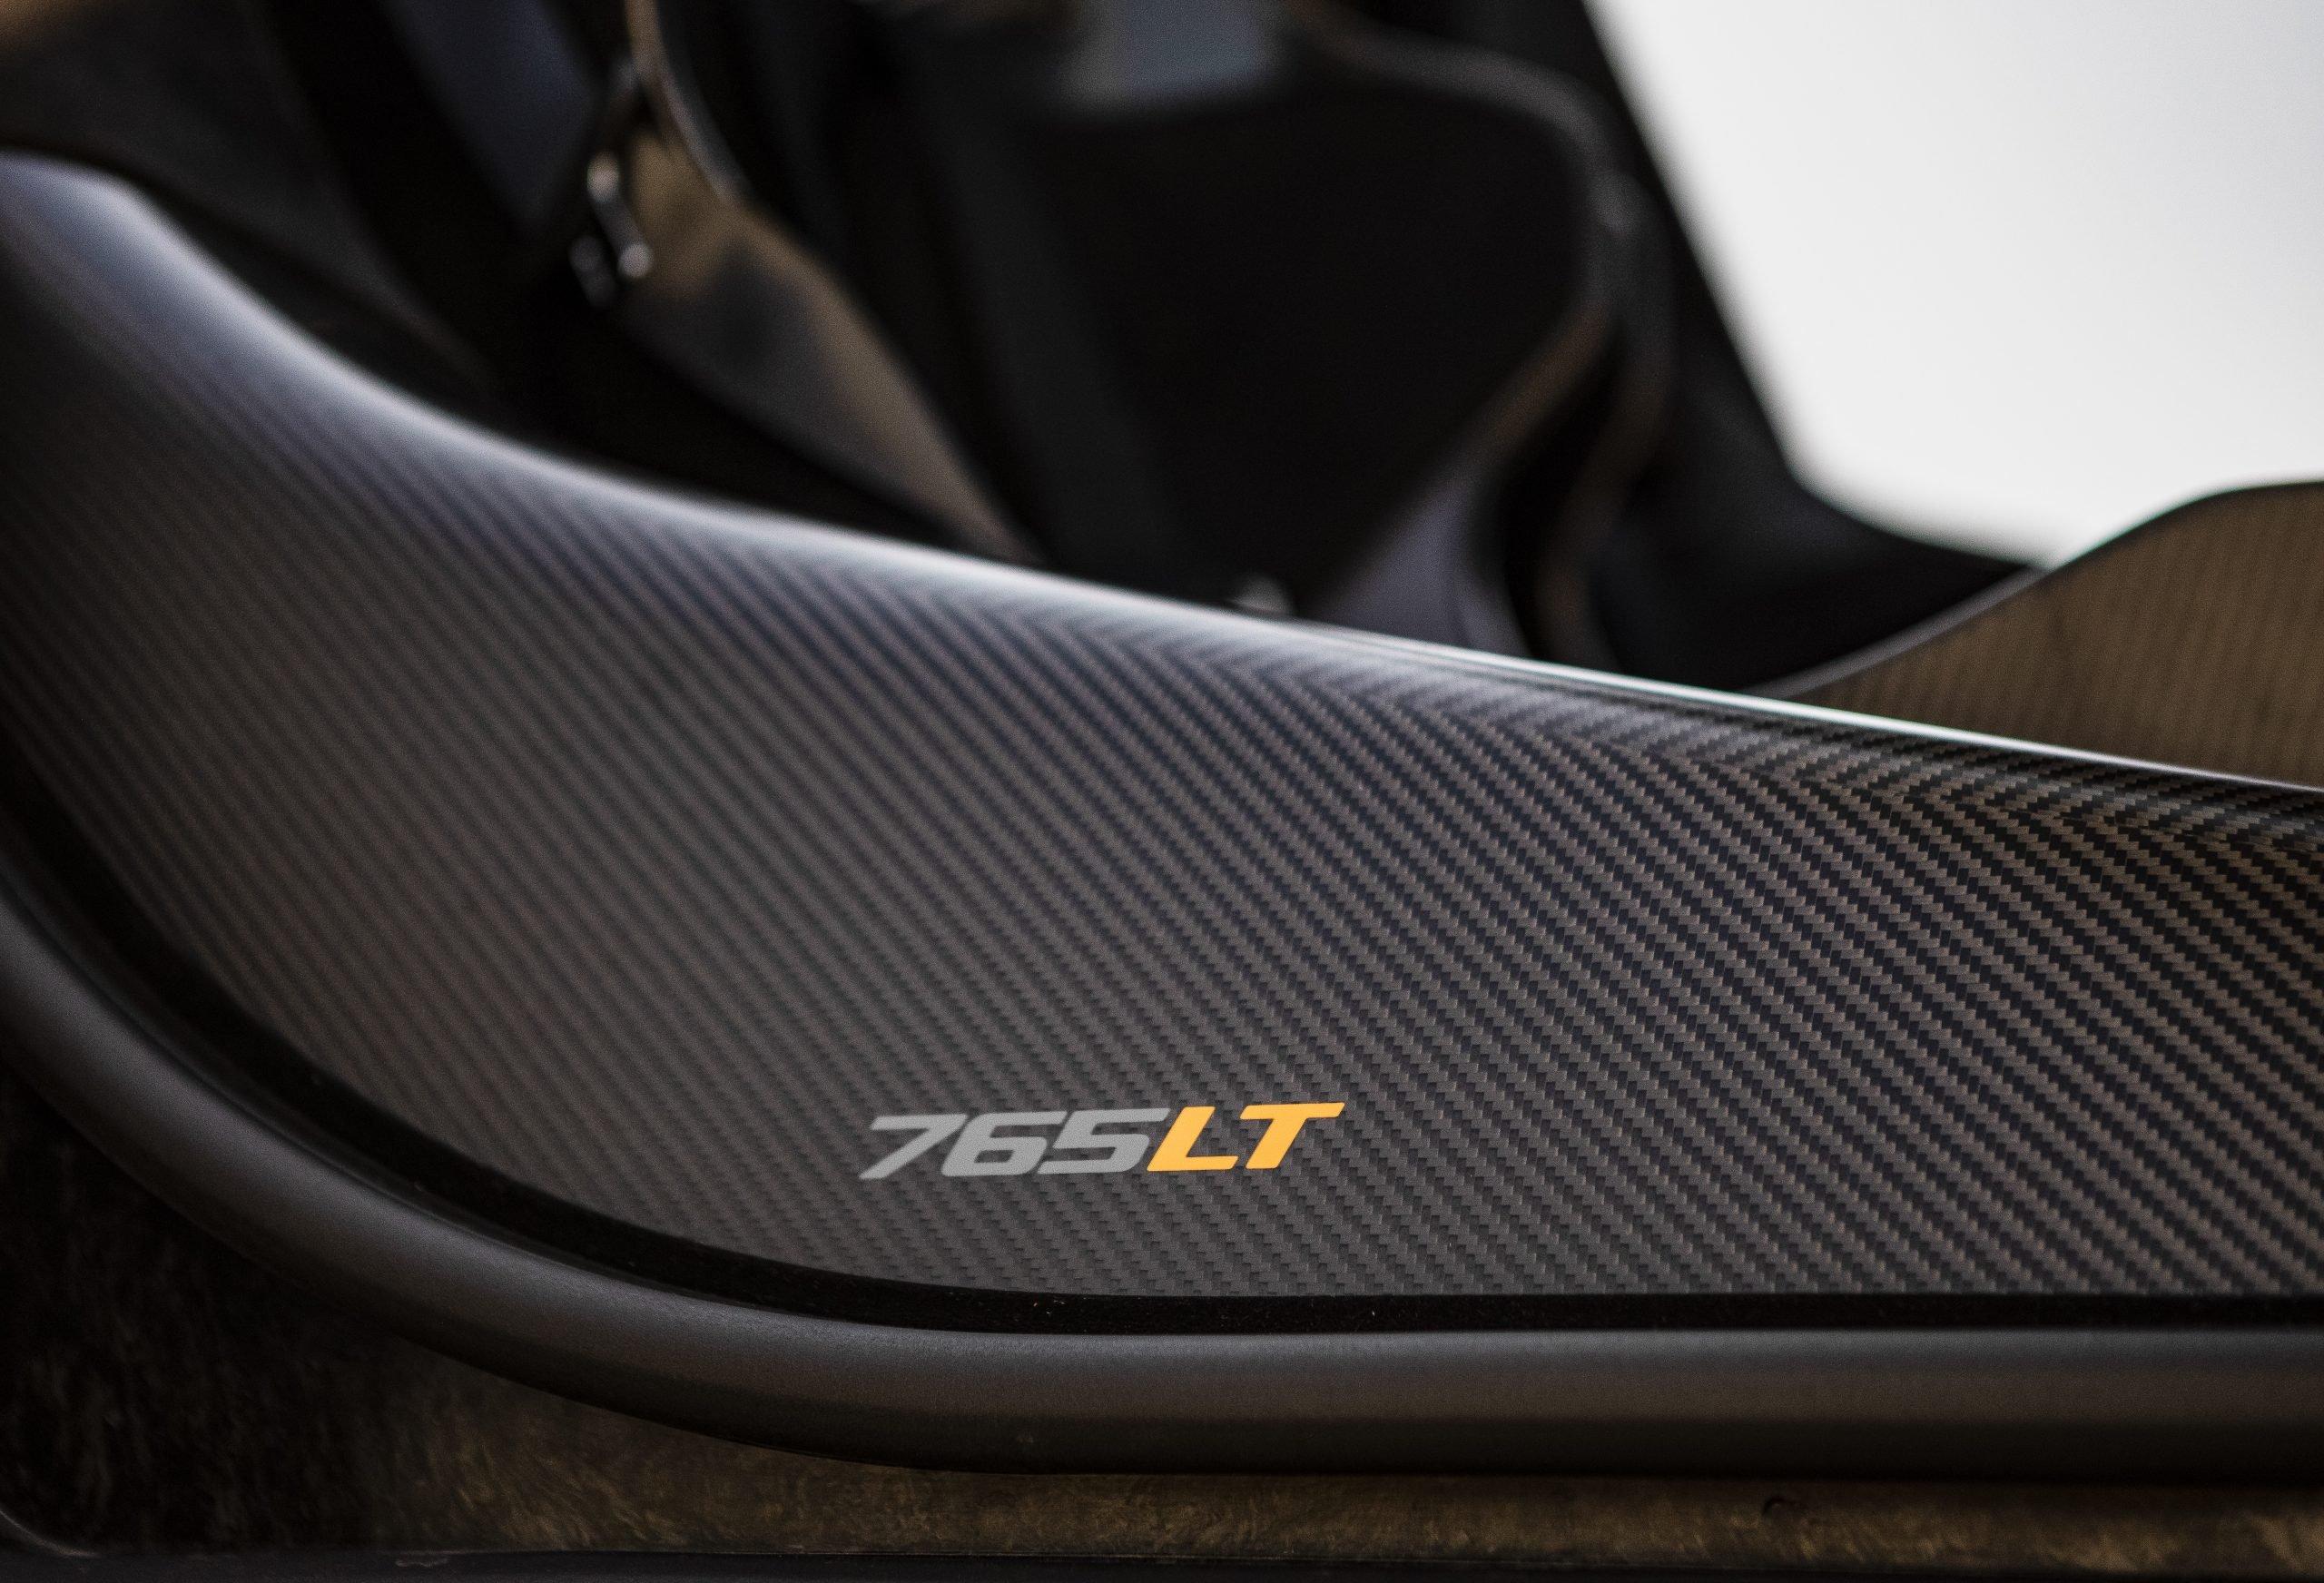 2021 McLaren 765LT Interior